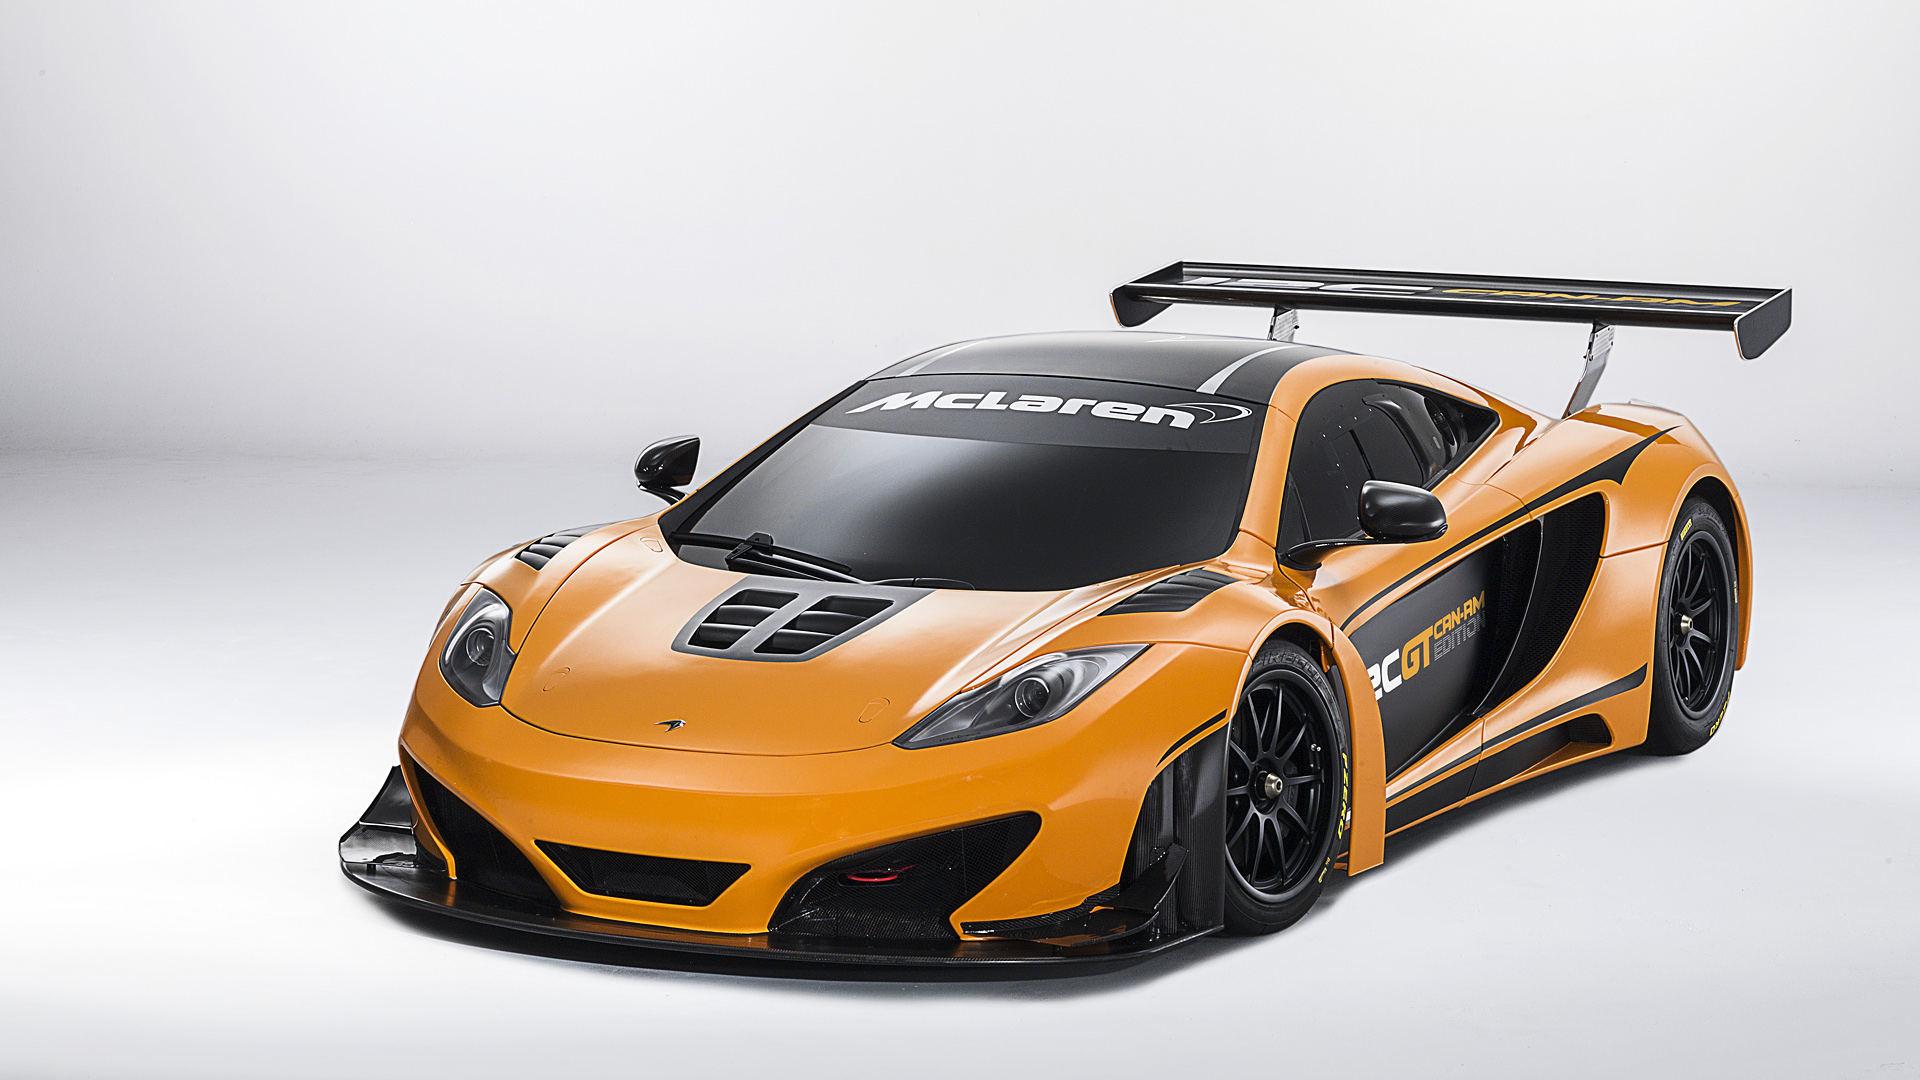 2012 McLaren MP4-12C Can-Am Edition